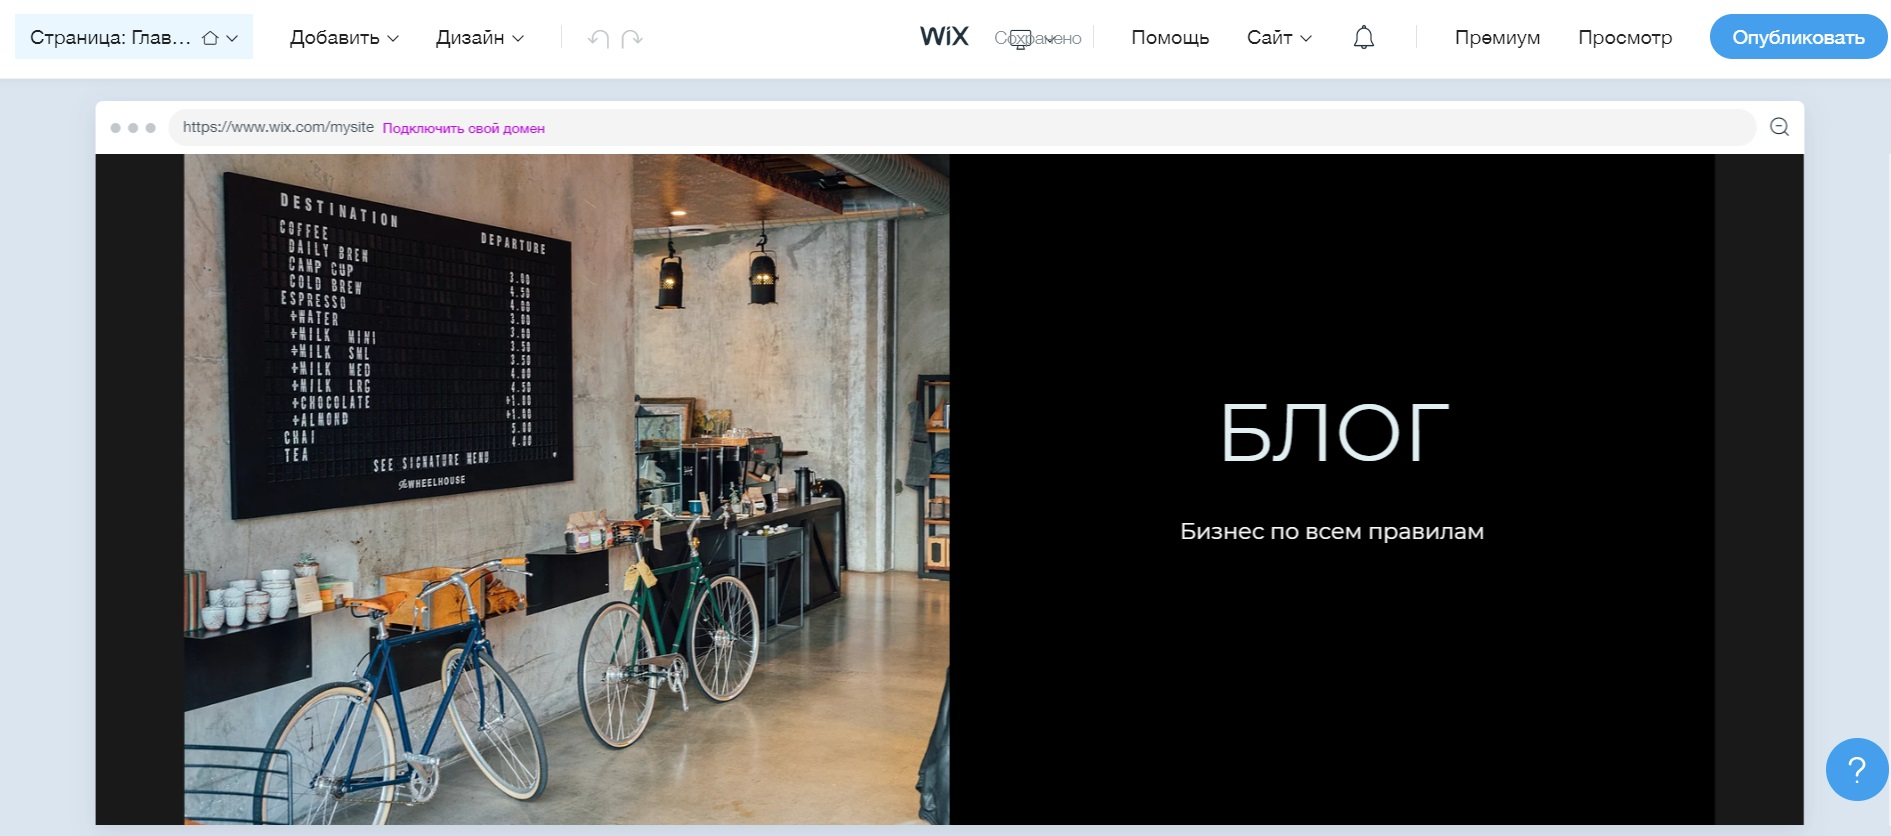 Интерфейс WIX